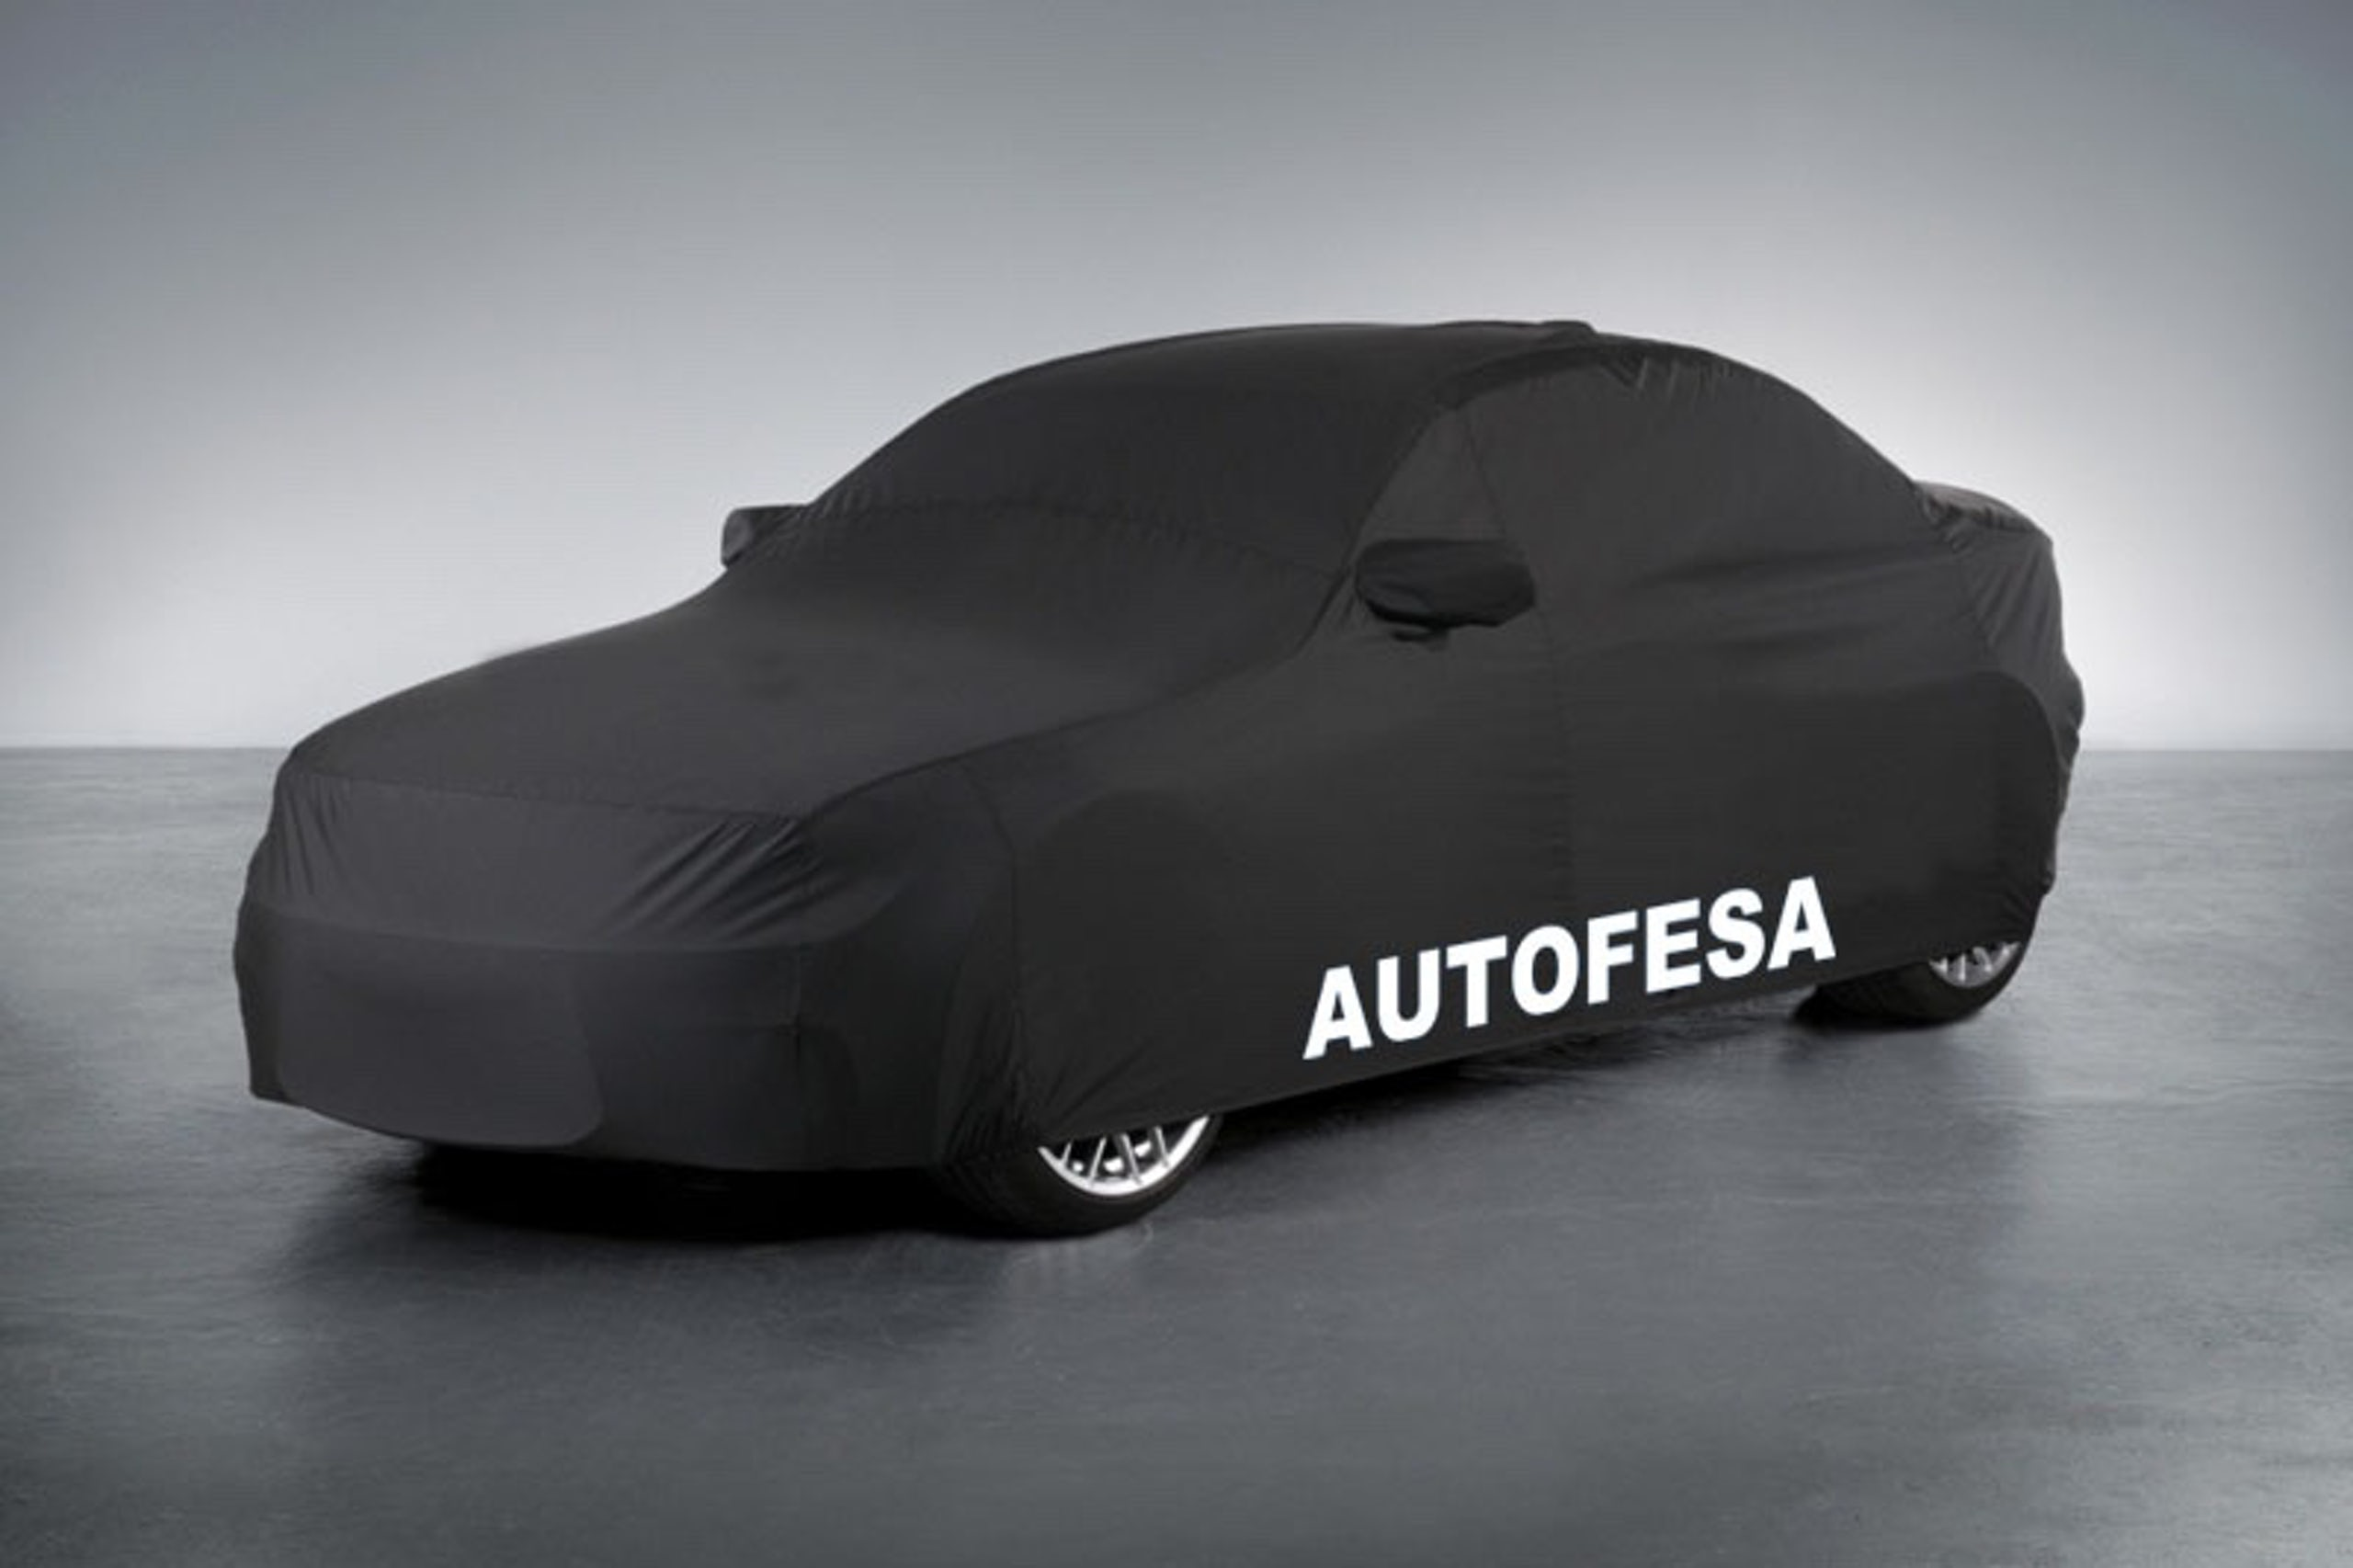 Audi A6 A6Avant COMPETITION ABT 3.0 TDI V6 T 326cv quattro 5p S tronic 4x4 Cpmpetition ABT S/S - Foto 40